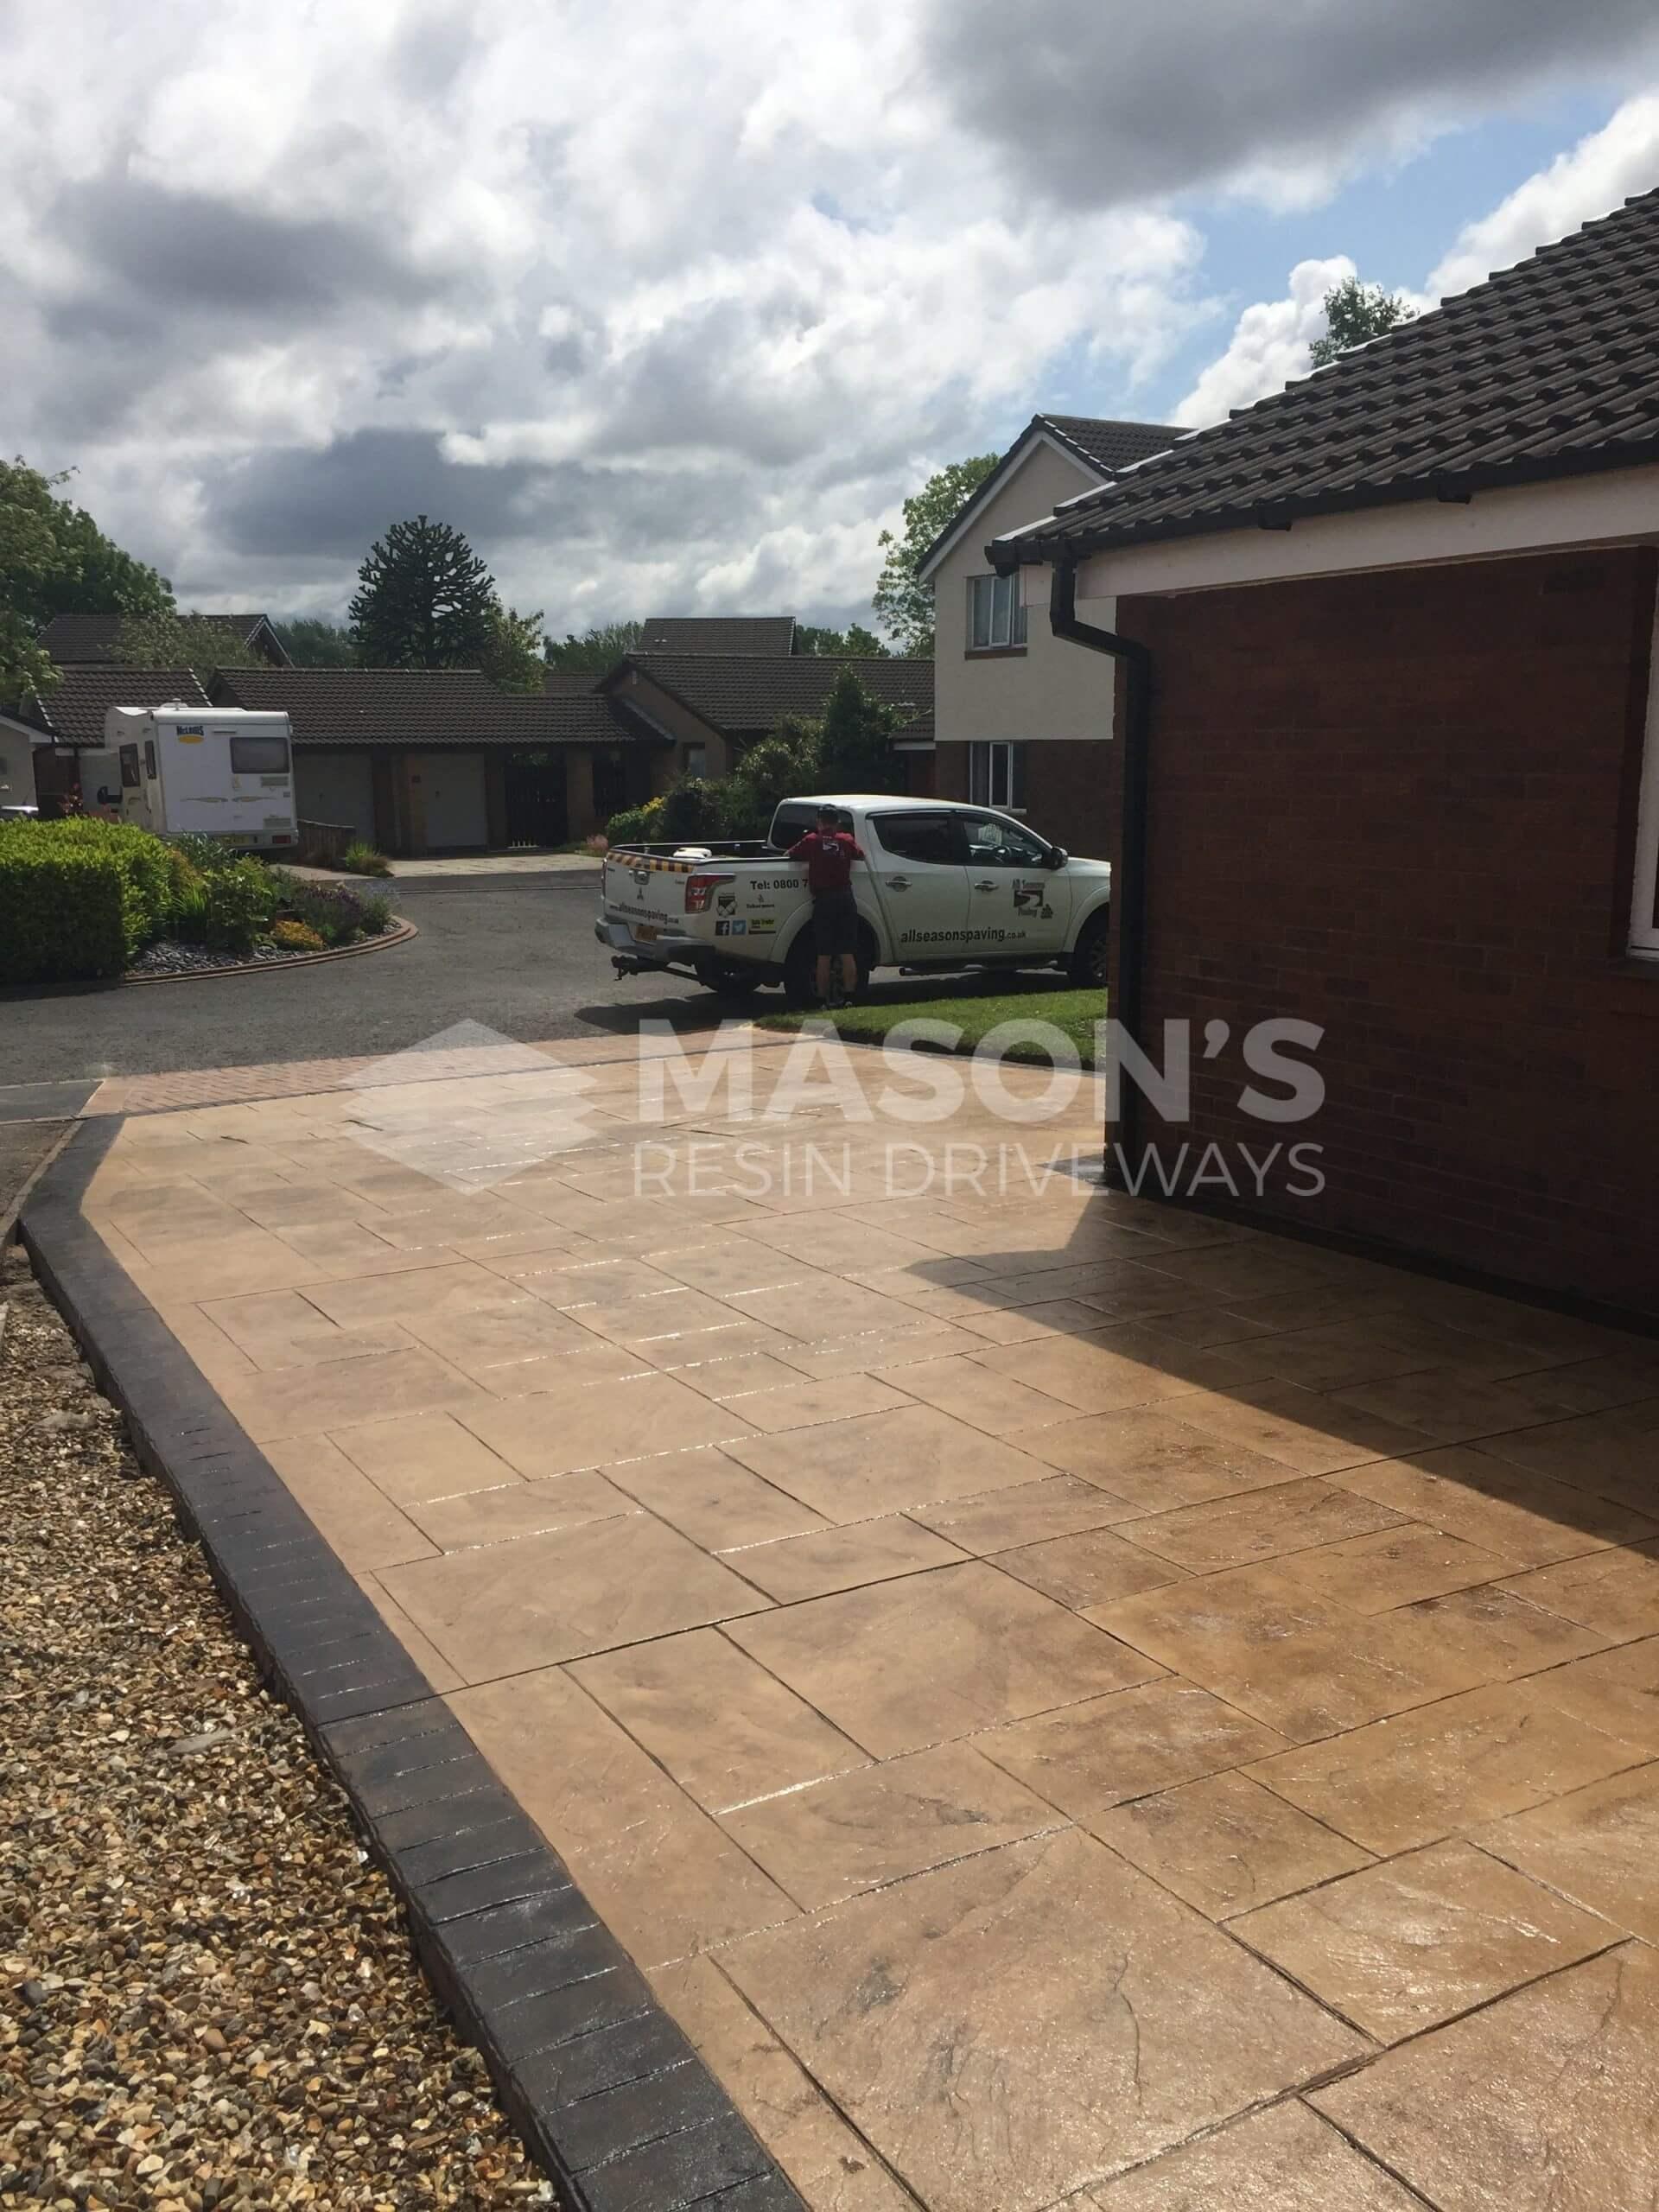 pattern imprinted concrete driveway in lea preston street view